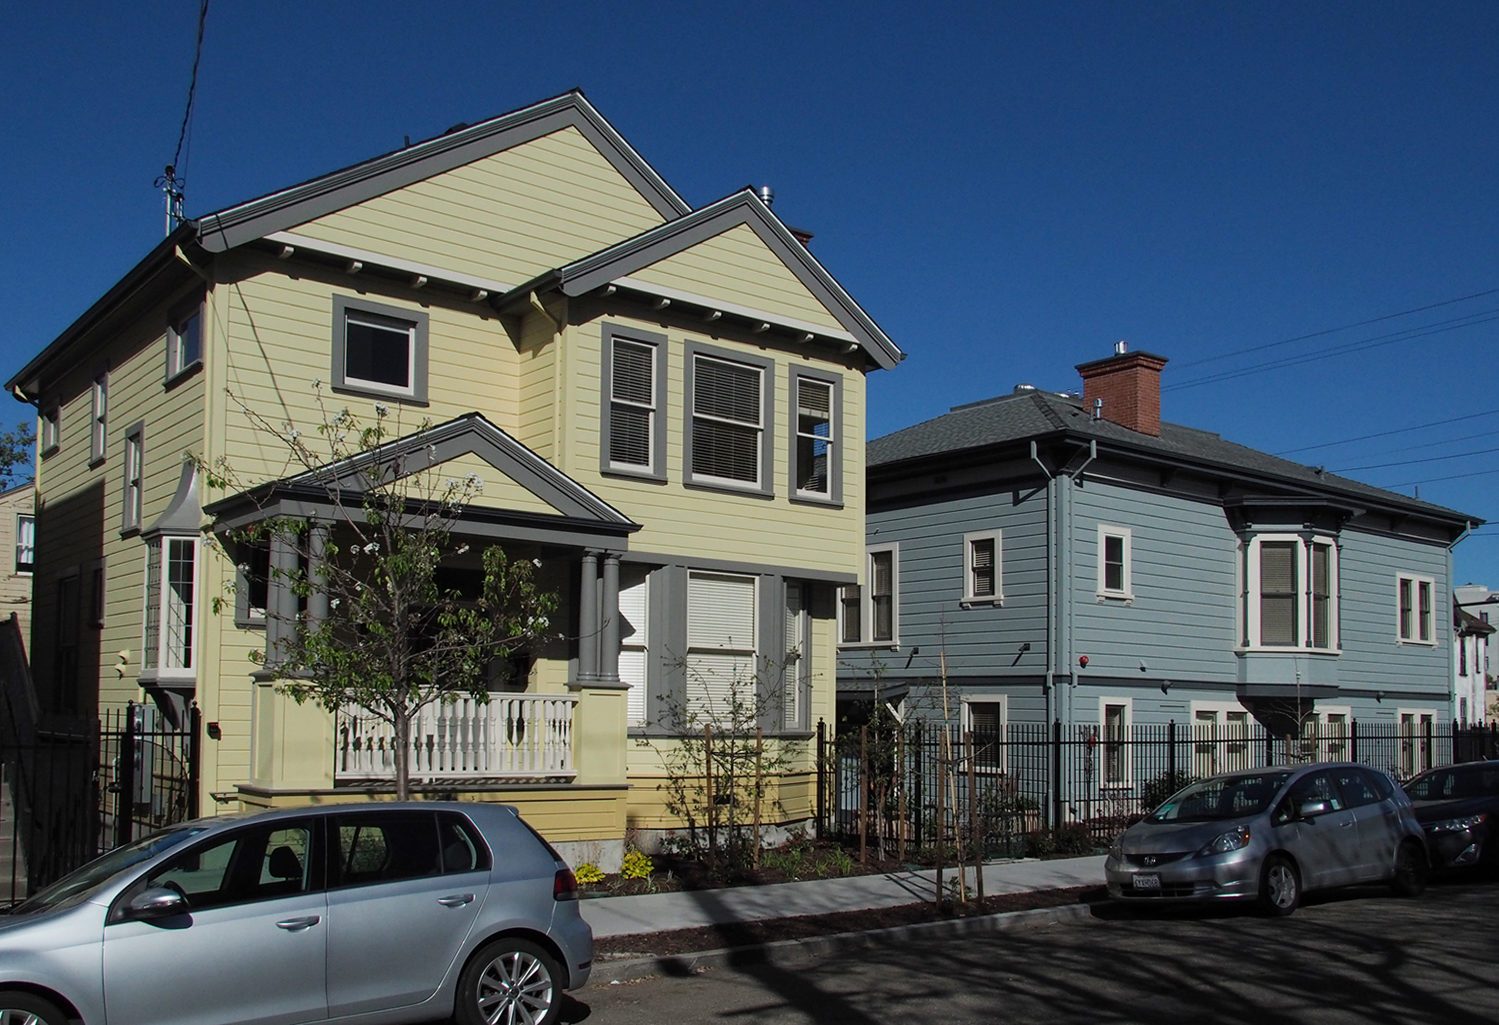 Ellen Blood House & John Woolley House, Berkeley, California